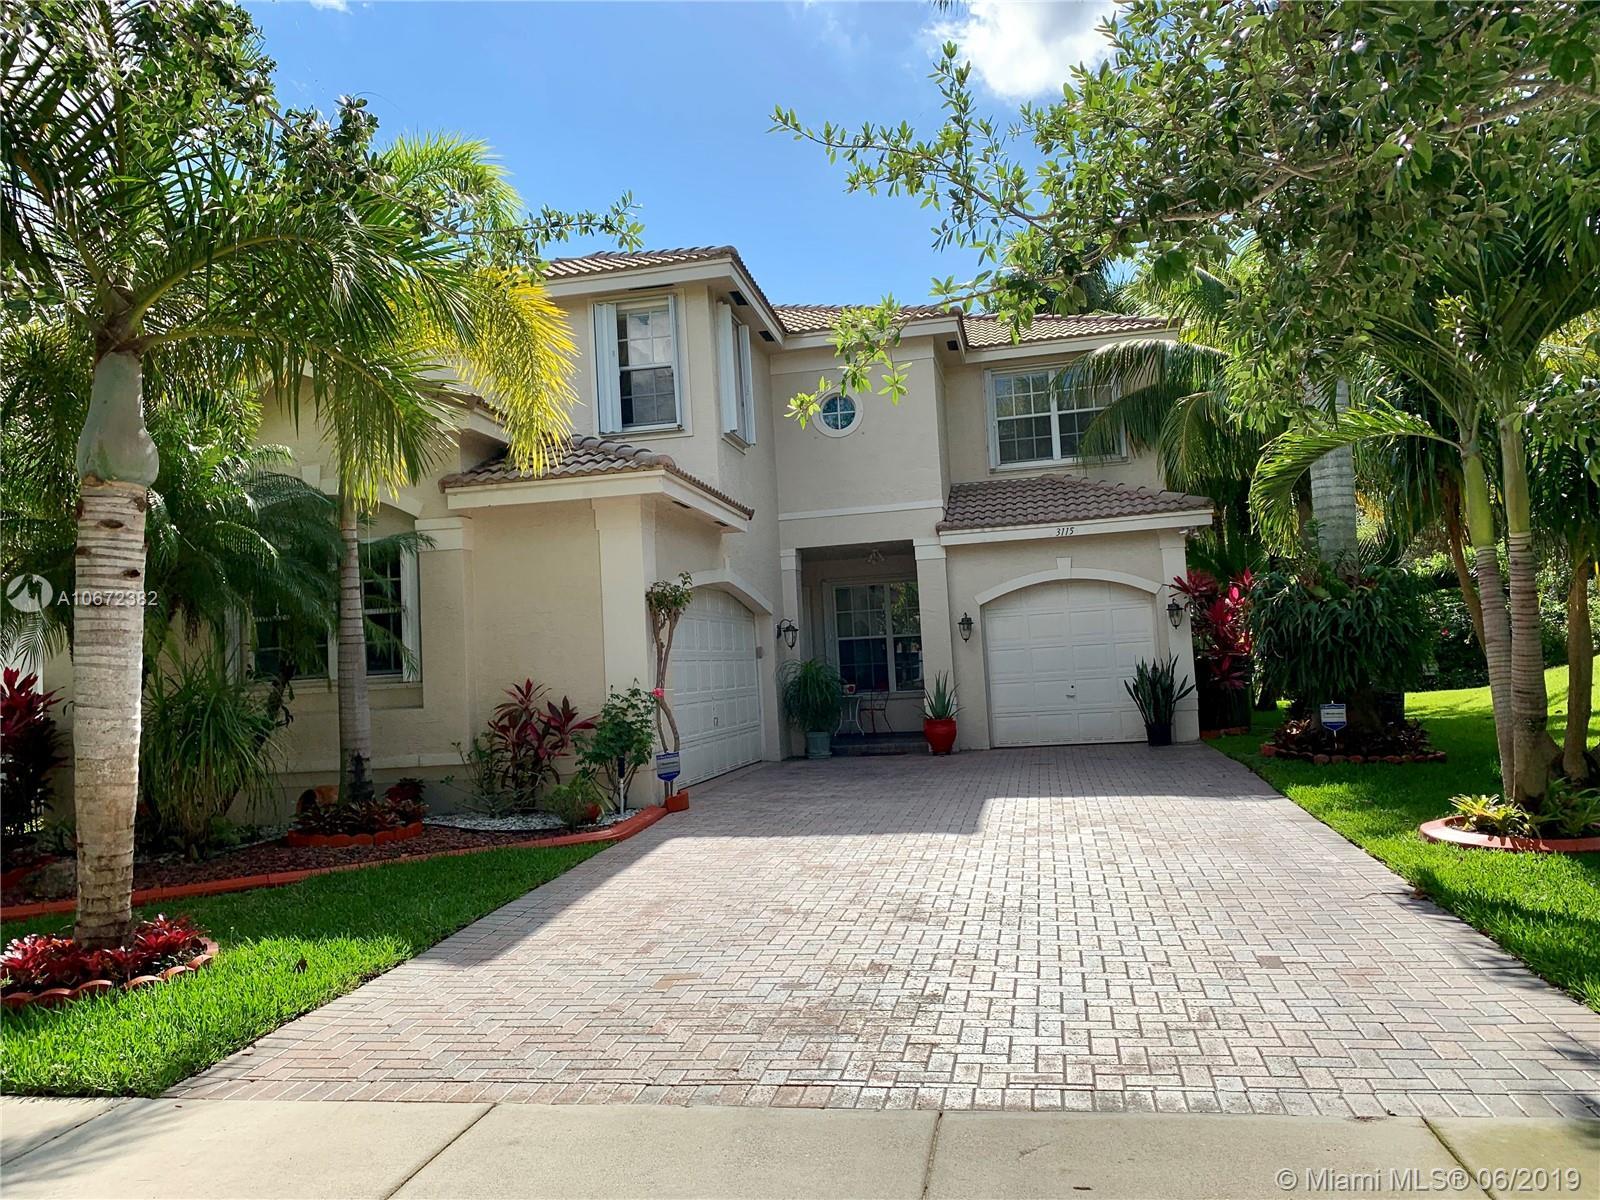 3115 SW 163rd Ave, Miramar, Florida